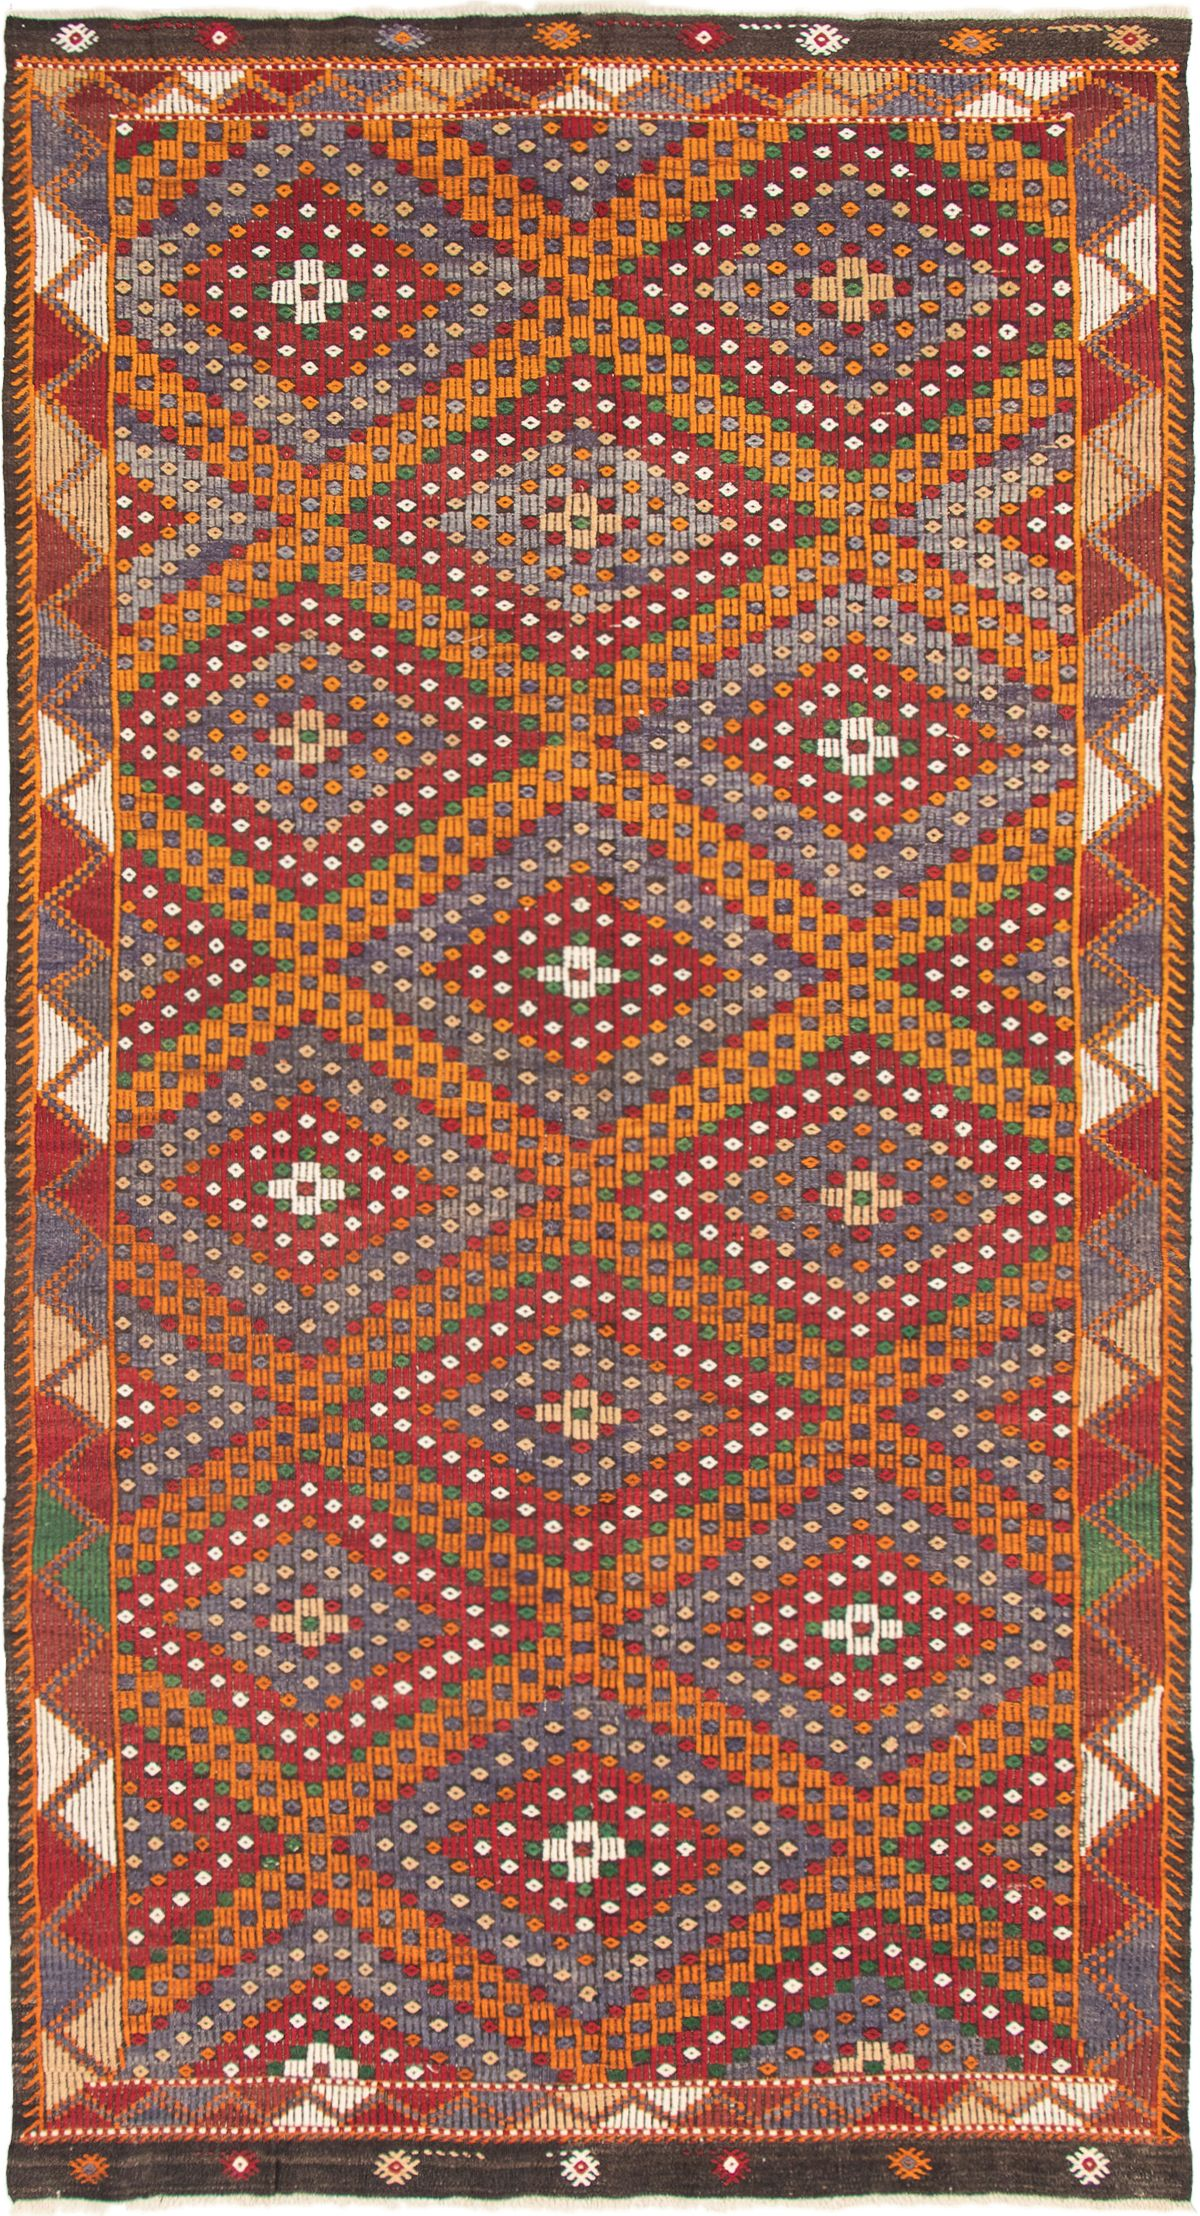 "Hand woven Yoruk Dark Red, Orange Wool Tapestry Kilim 6'1"" x 11'7"" Size: 6'1"" x 11'7"""